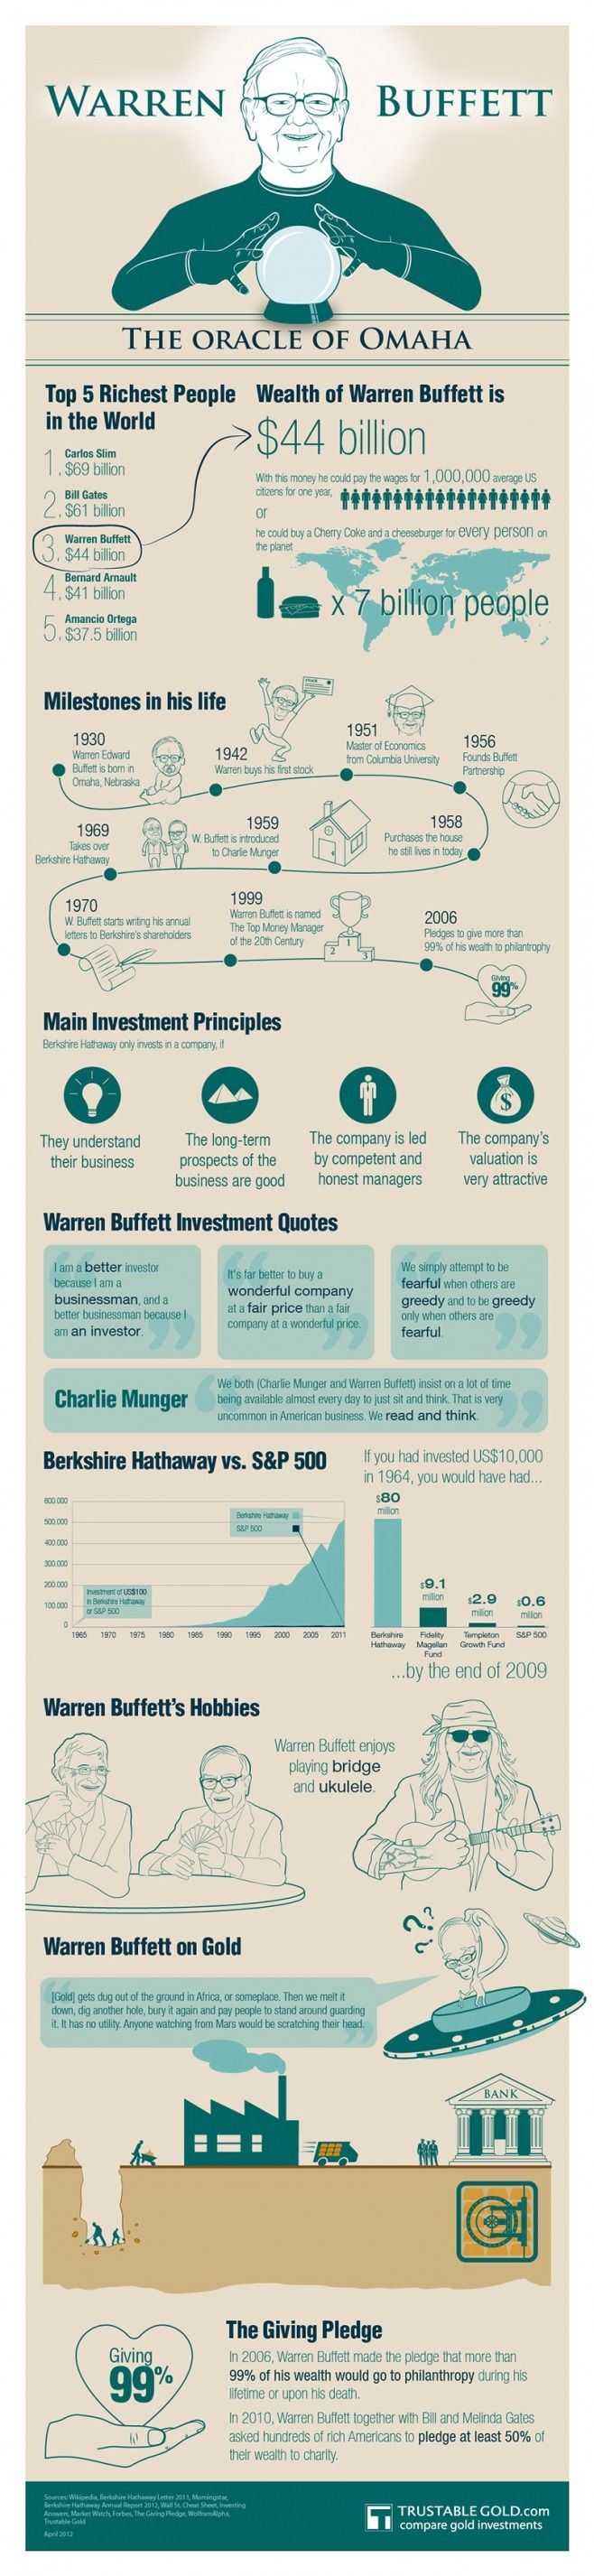 Timeline de Warren Buffett #infografia #infographic